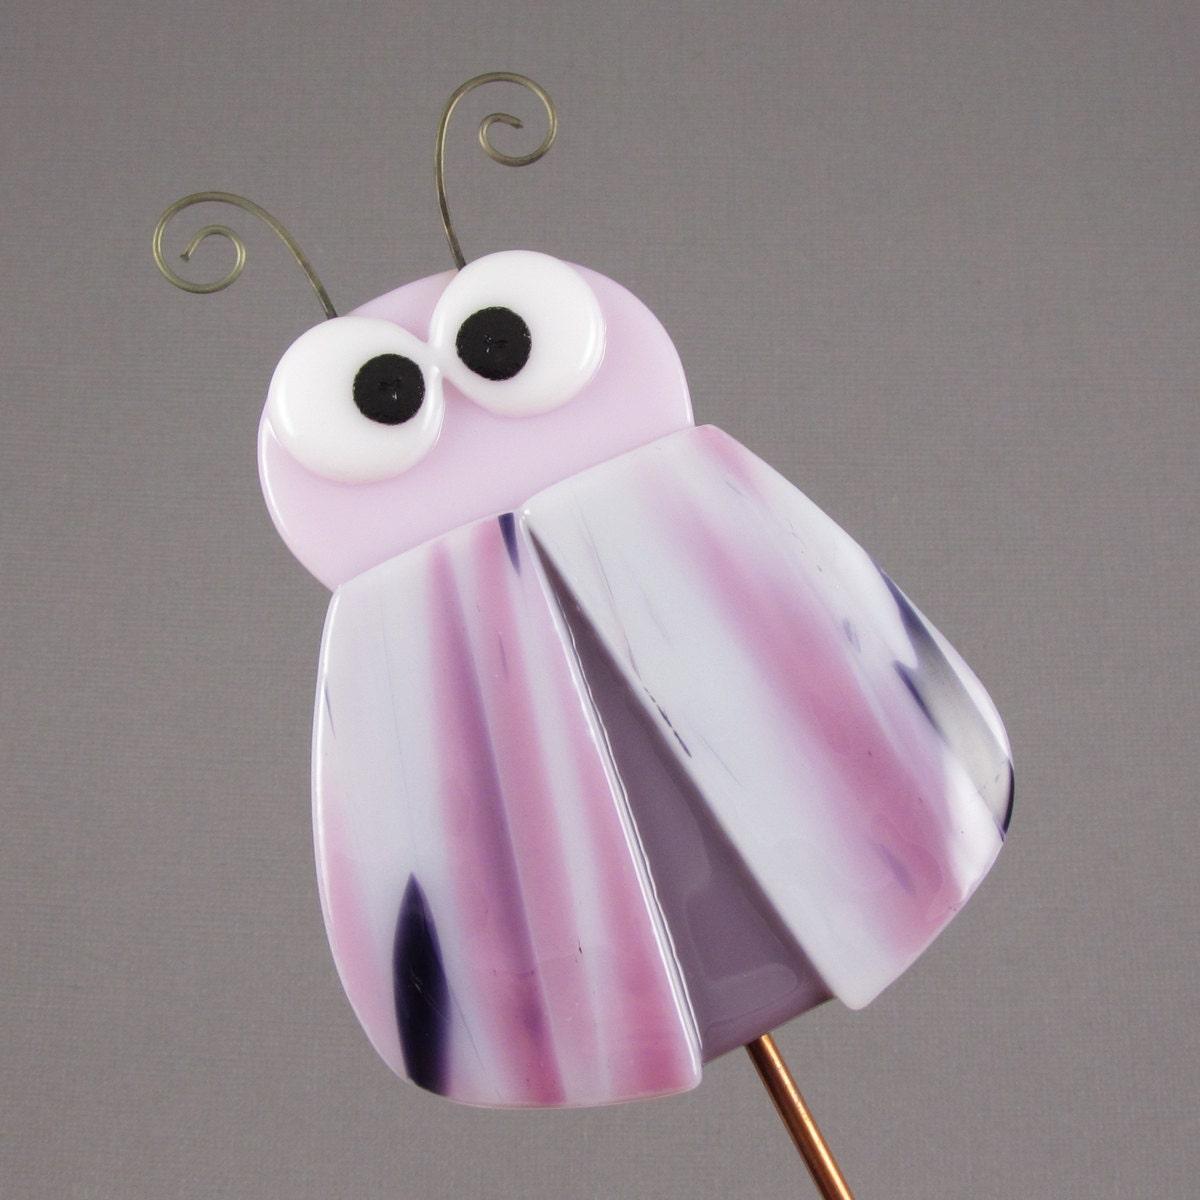 Bug Garden Stake - Crazy Fused Glass Bug - Pink, Purple & White - AngelasGlassStudio